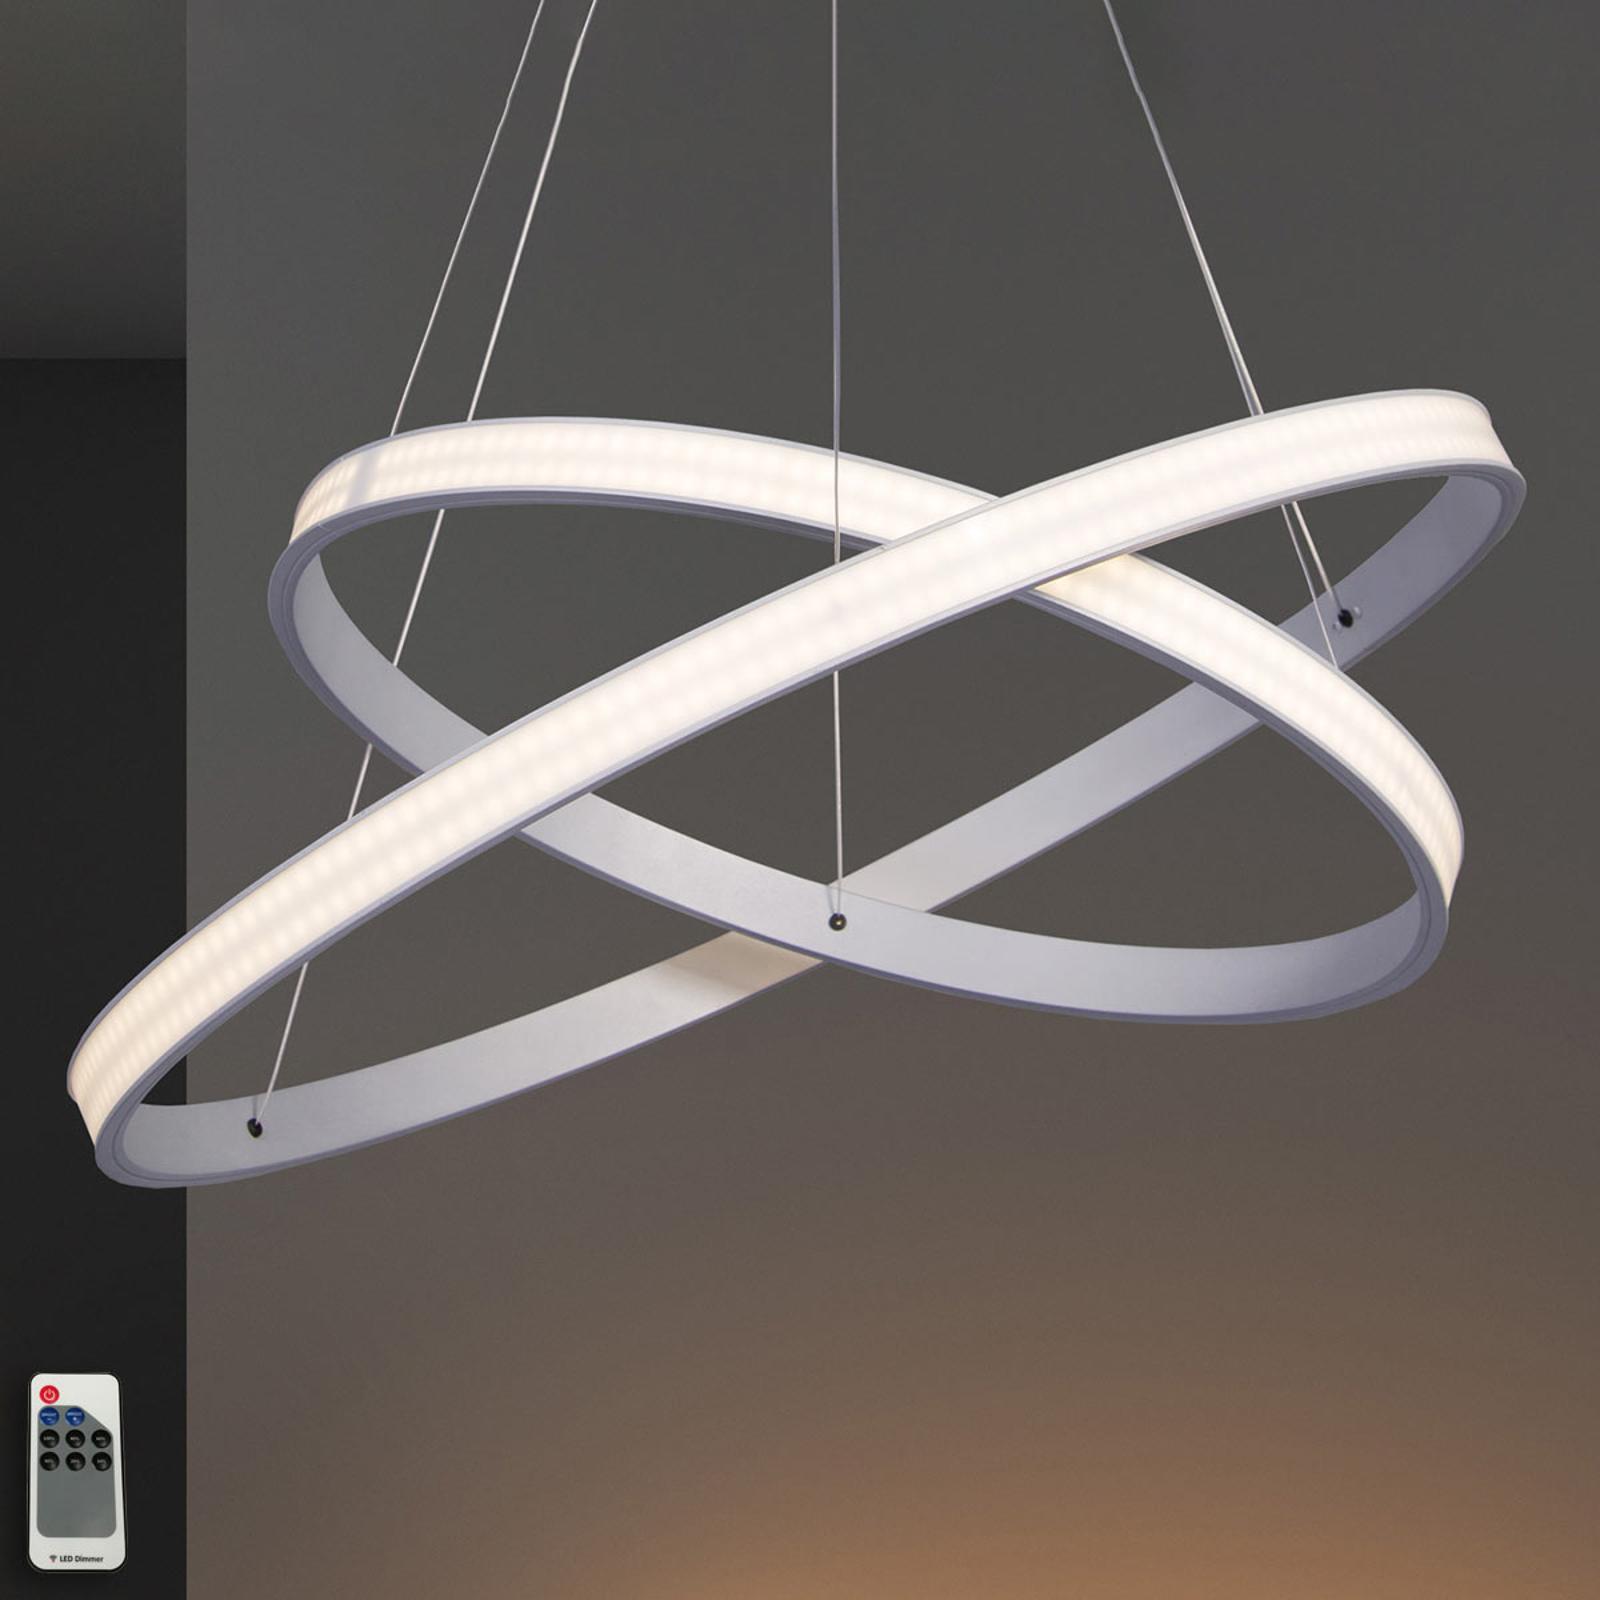 LED-riippulamppu Largo Ø 59 cm alumiini